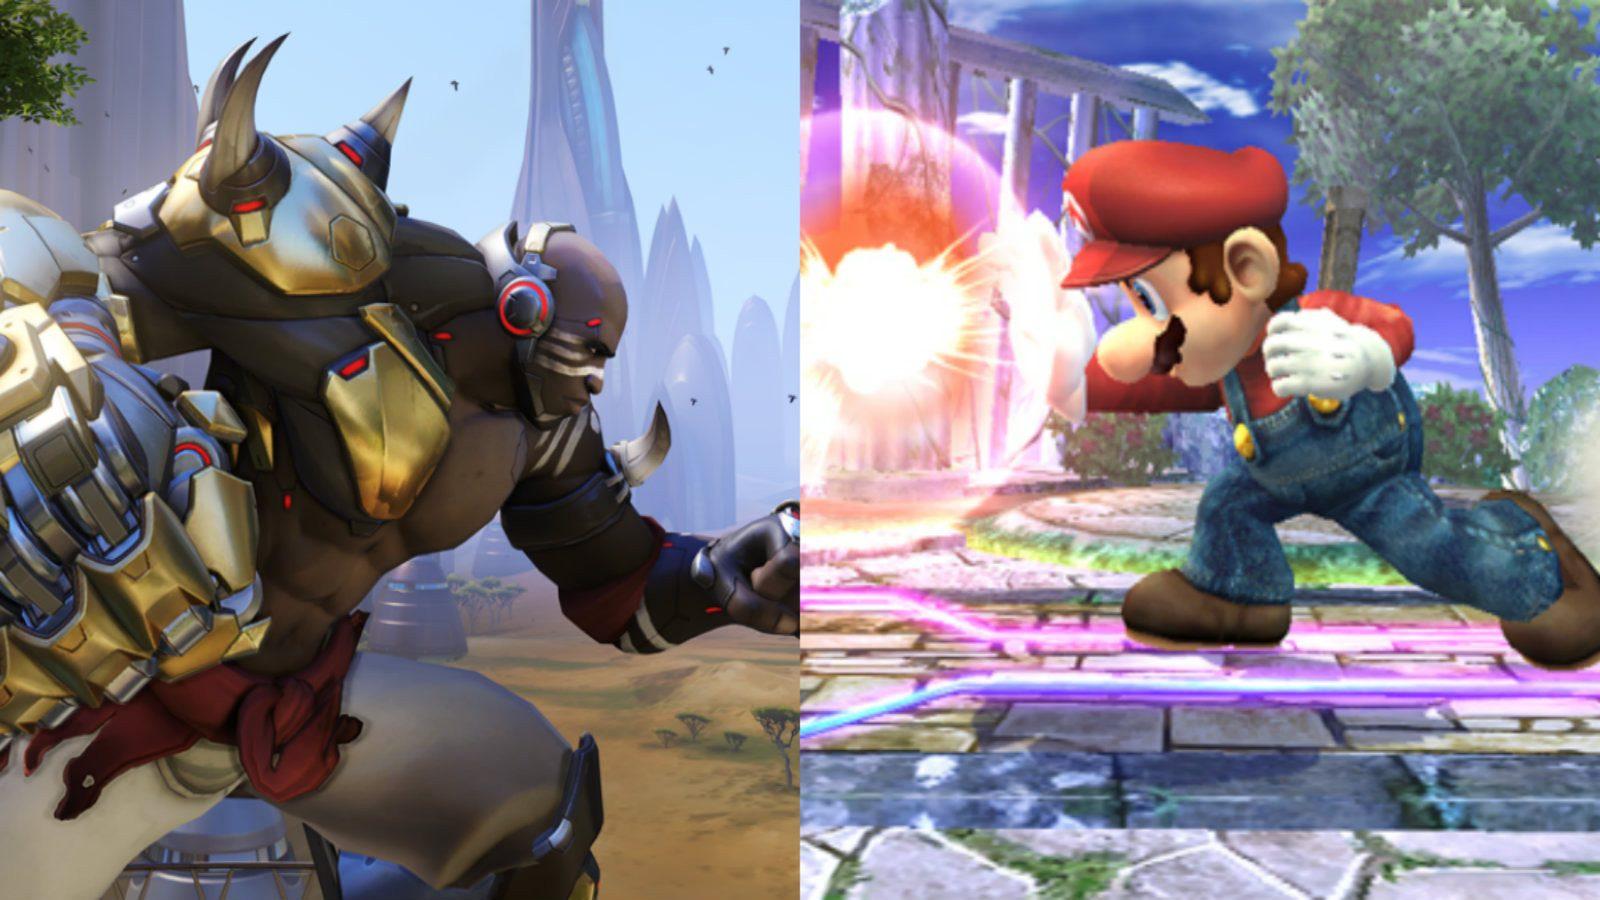 Doomfist and Mario